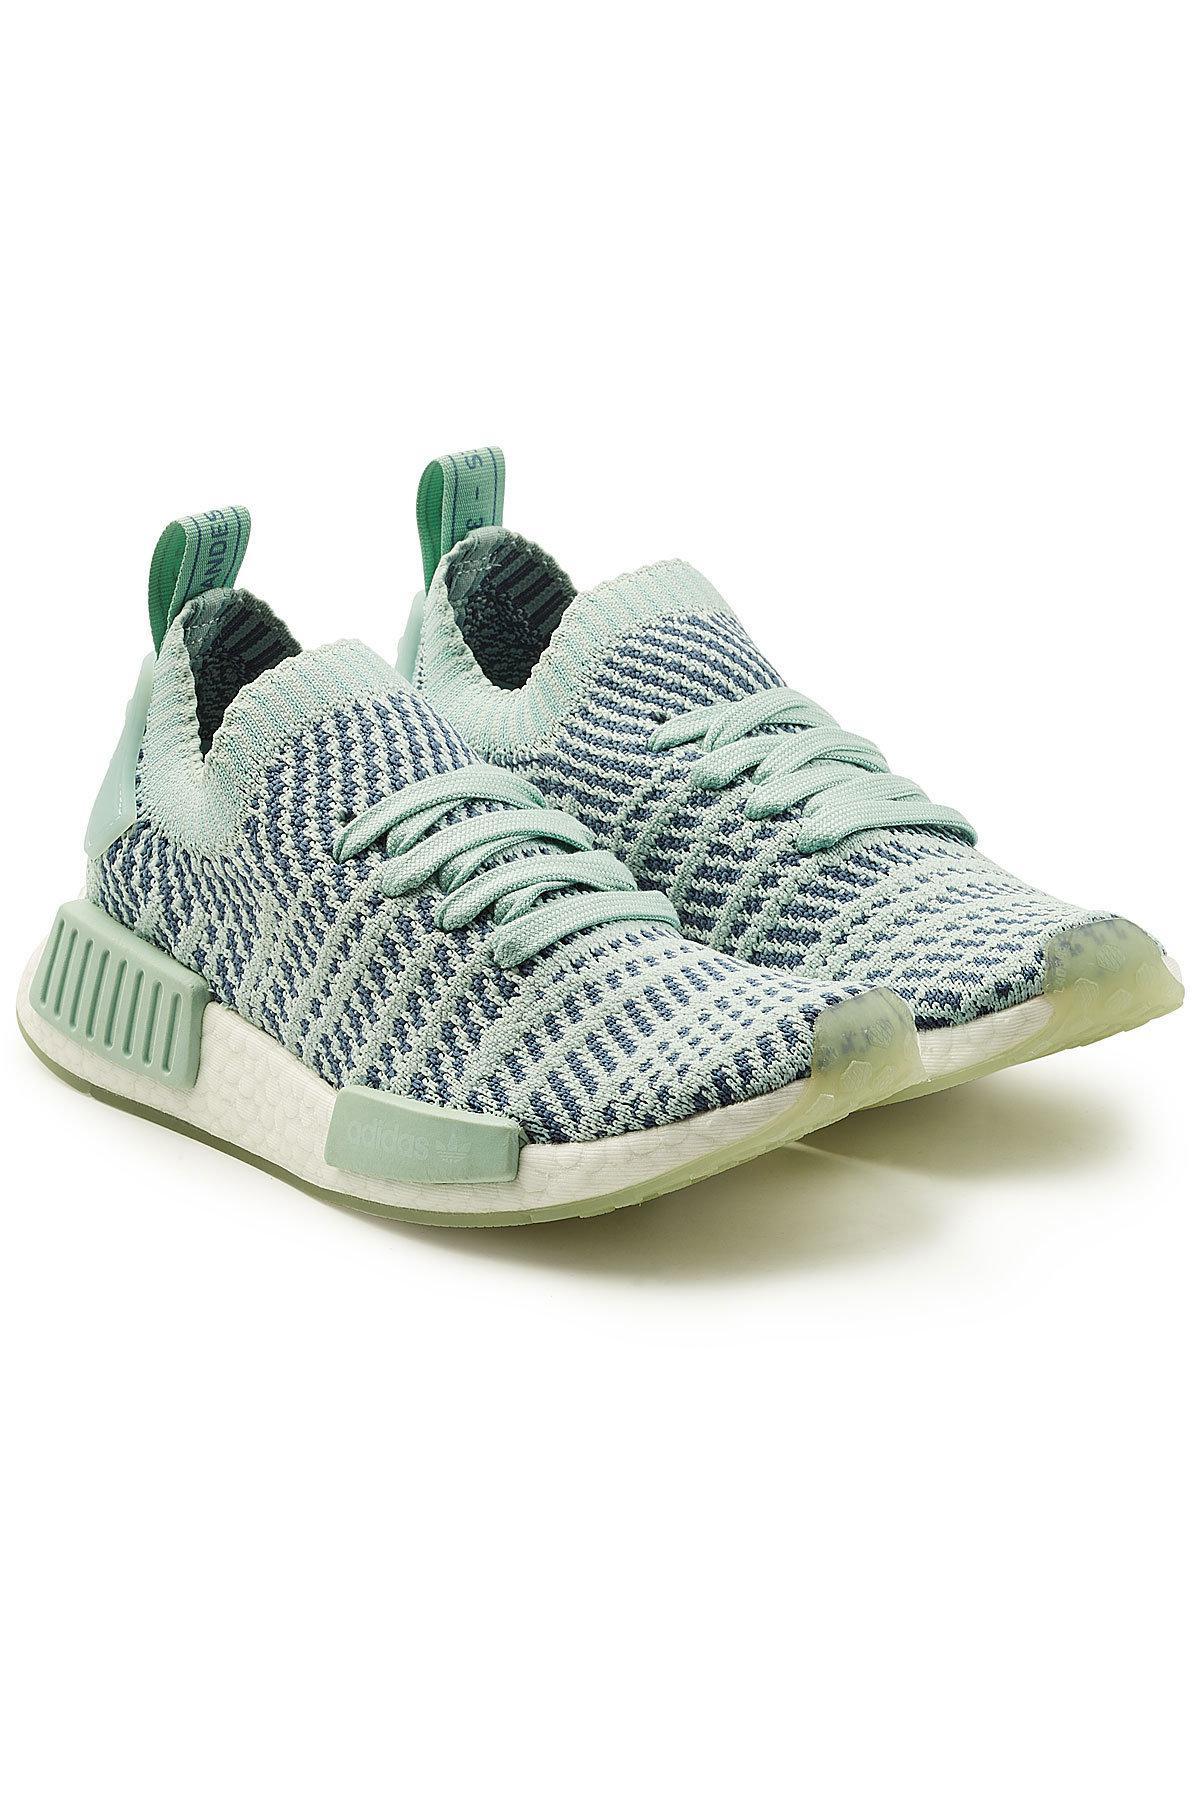 lyst adidas originali nmd r1 stlt primeknit scarpe